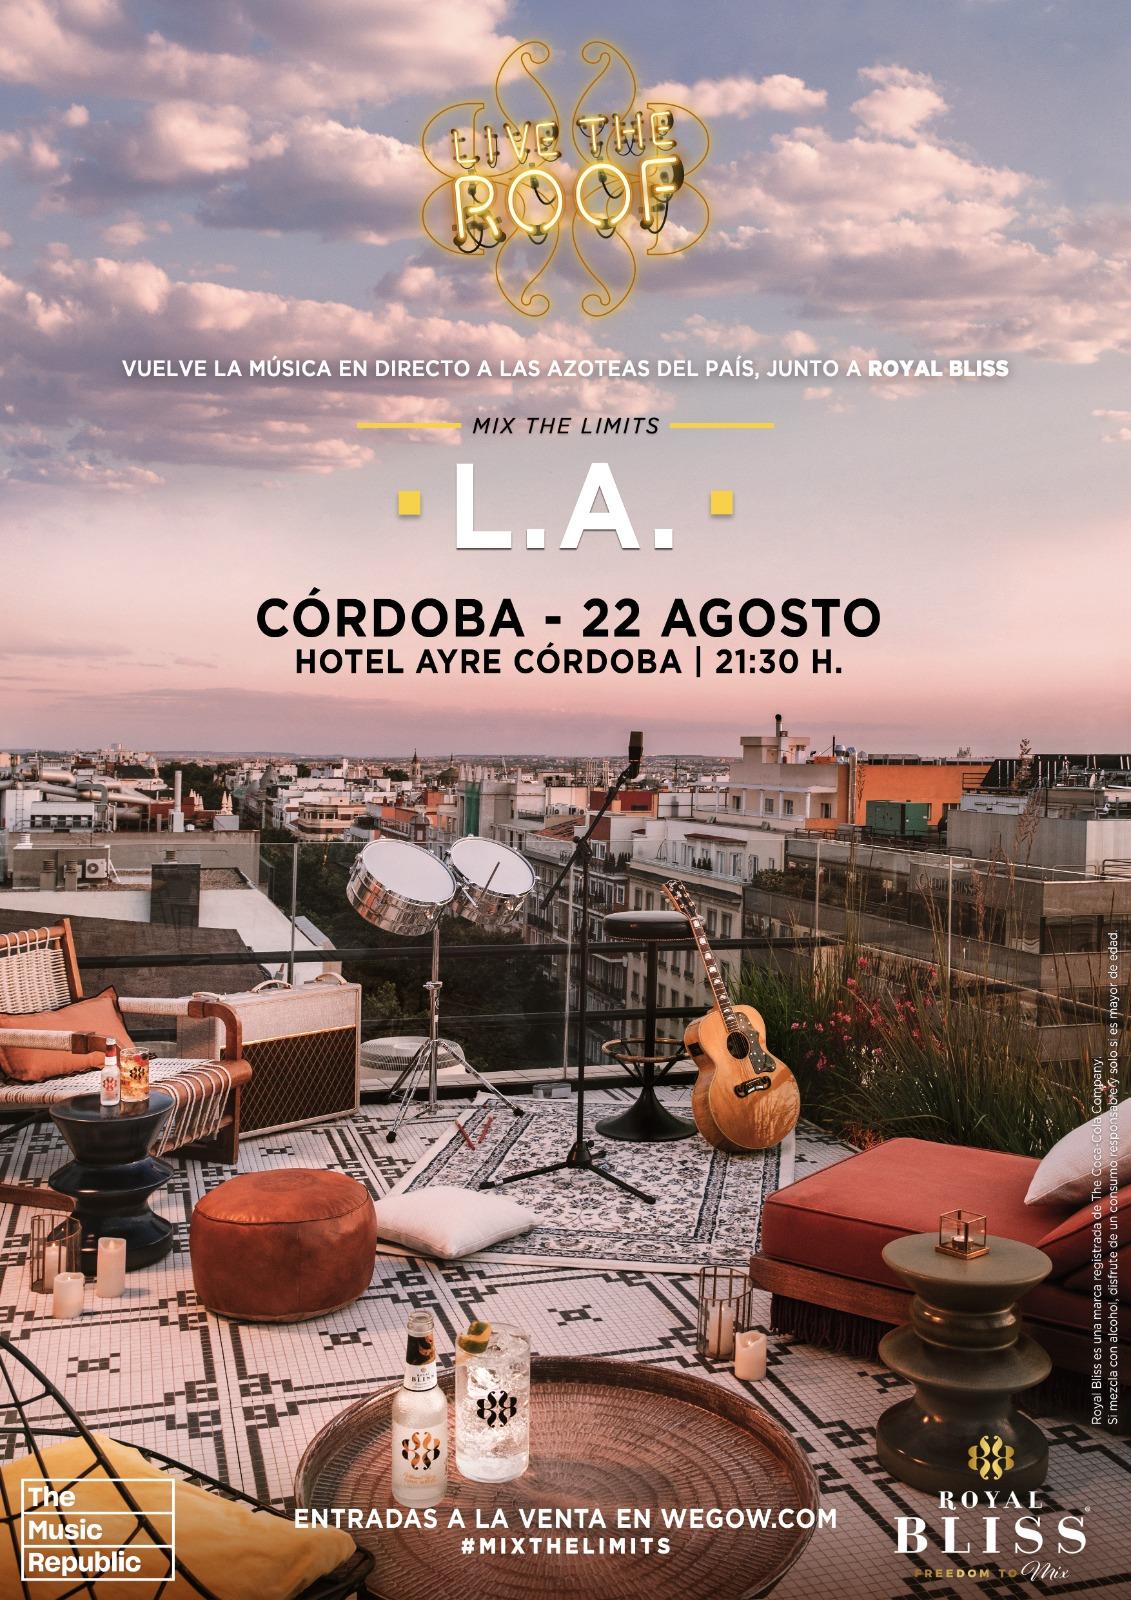 la en live the roof cordoba 16236772955598798